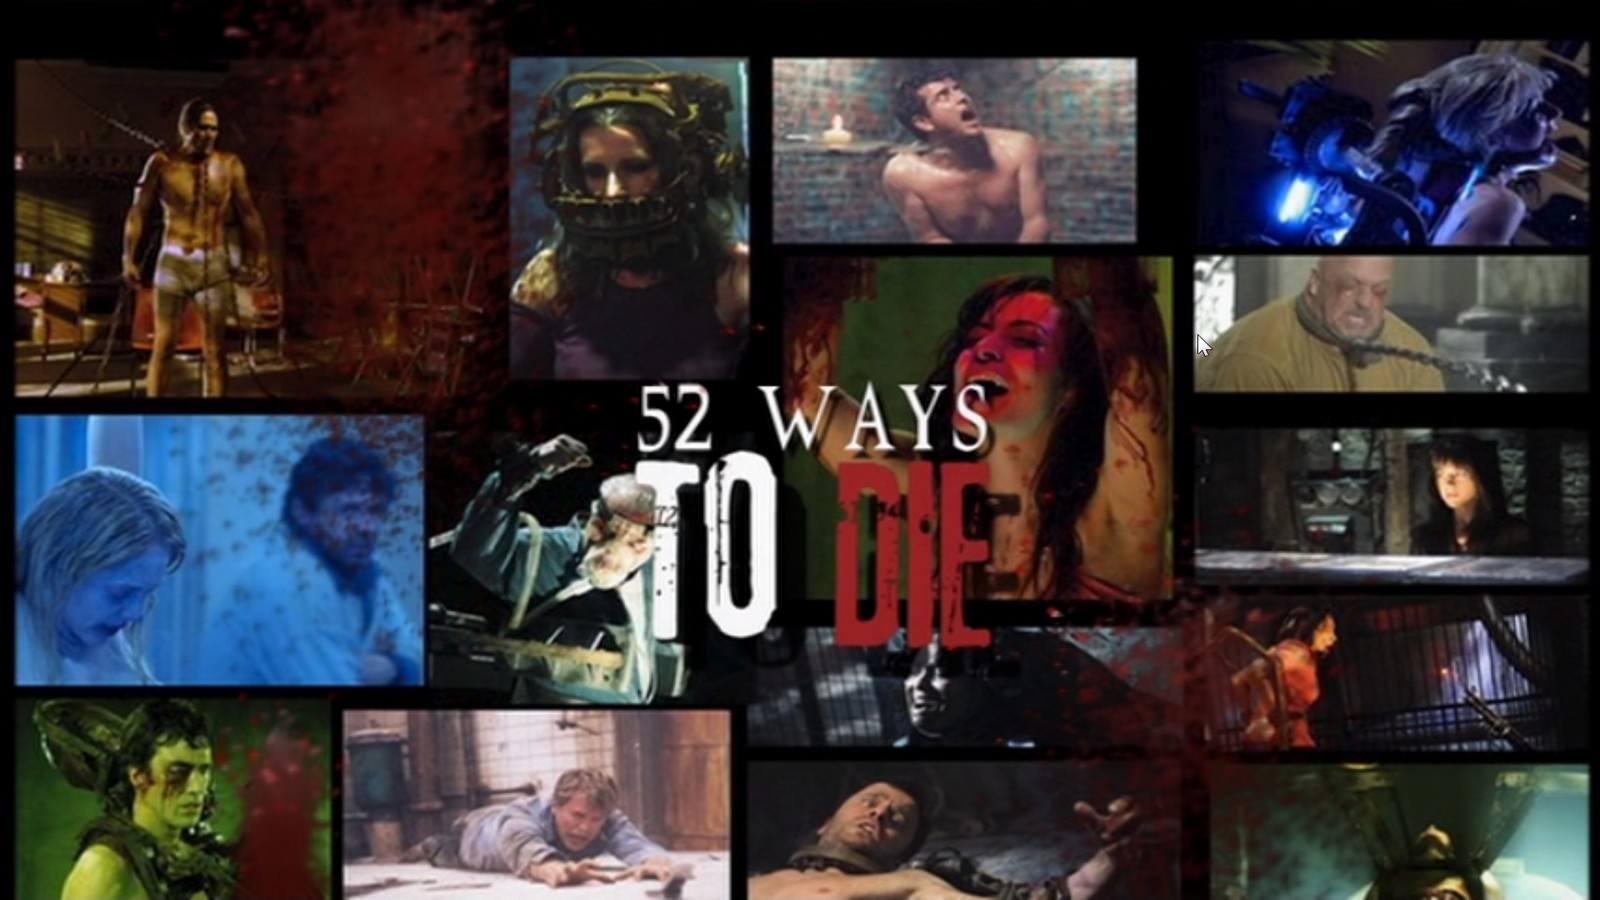 Movie, Saw 3D(美國, 2010年) / 奪魂鋸3D(台灣) / 恐懼鬥室3D:終極審判(香港) / 电锯惊魂7(網路), 電影DVD, 額外收錄, 52 wayS to die